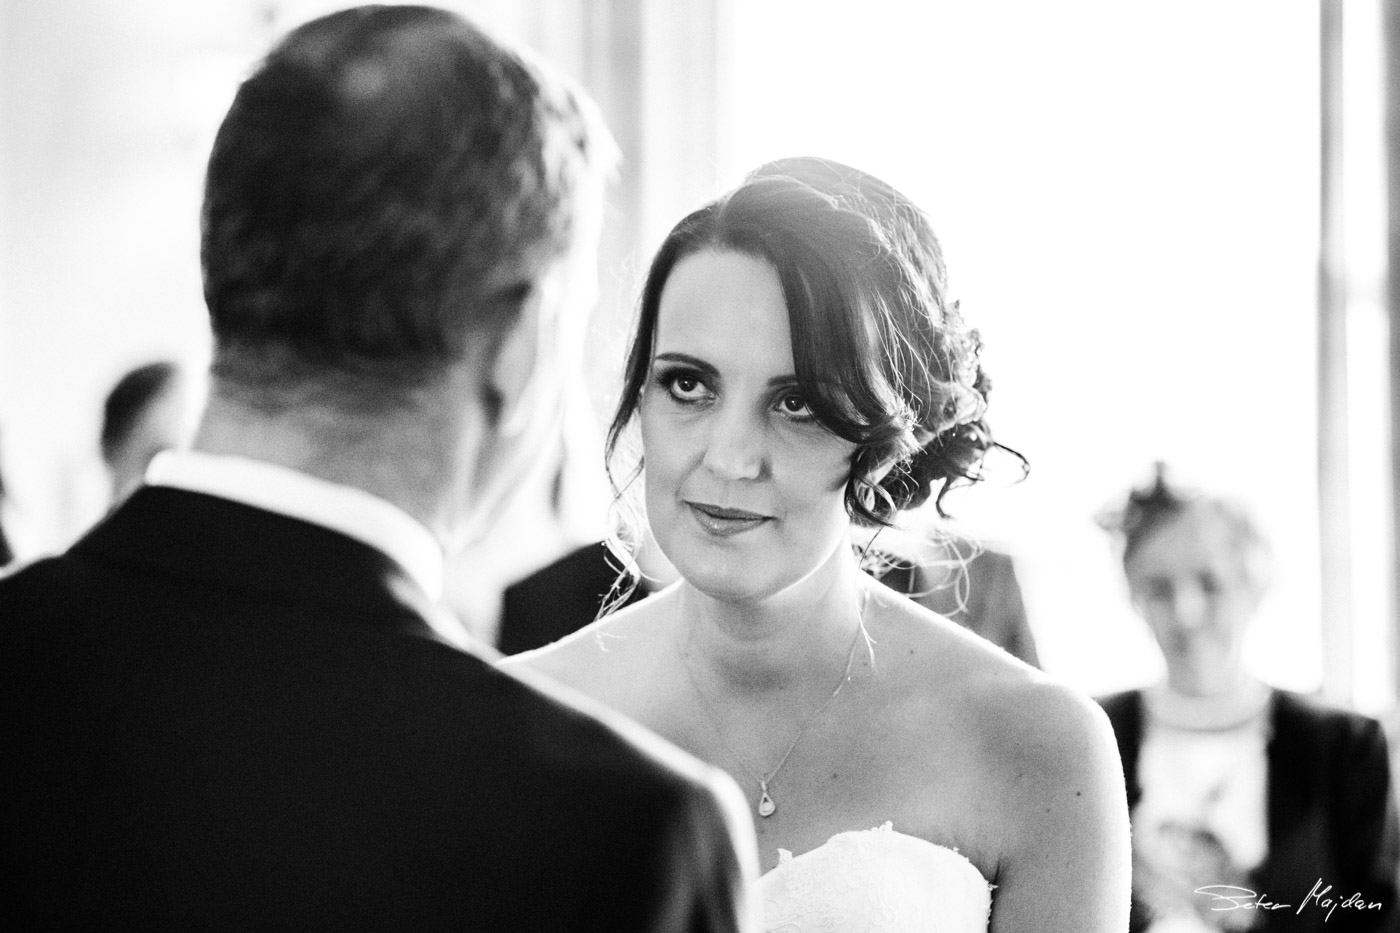 east-bridgford-hill-wedding-photography-29.jpg